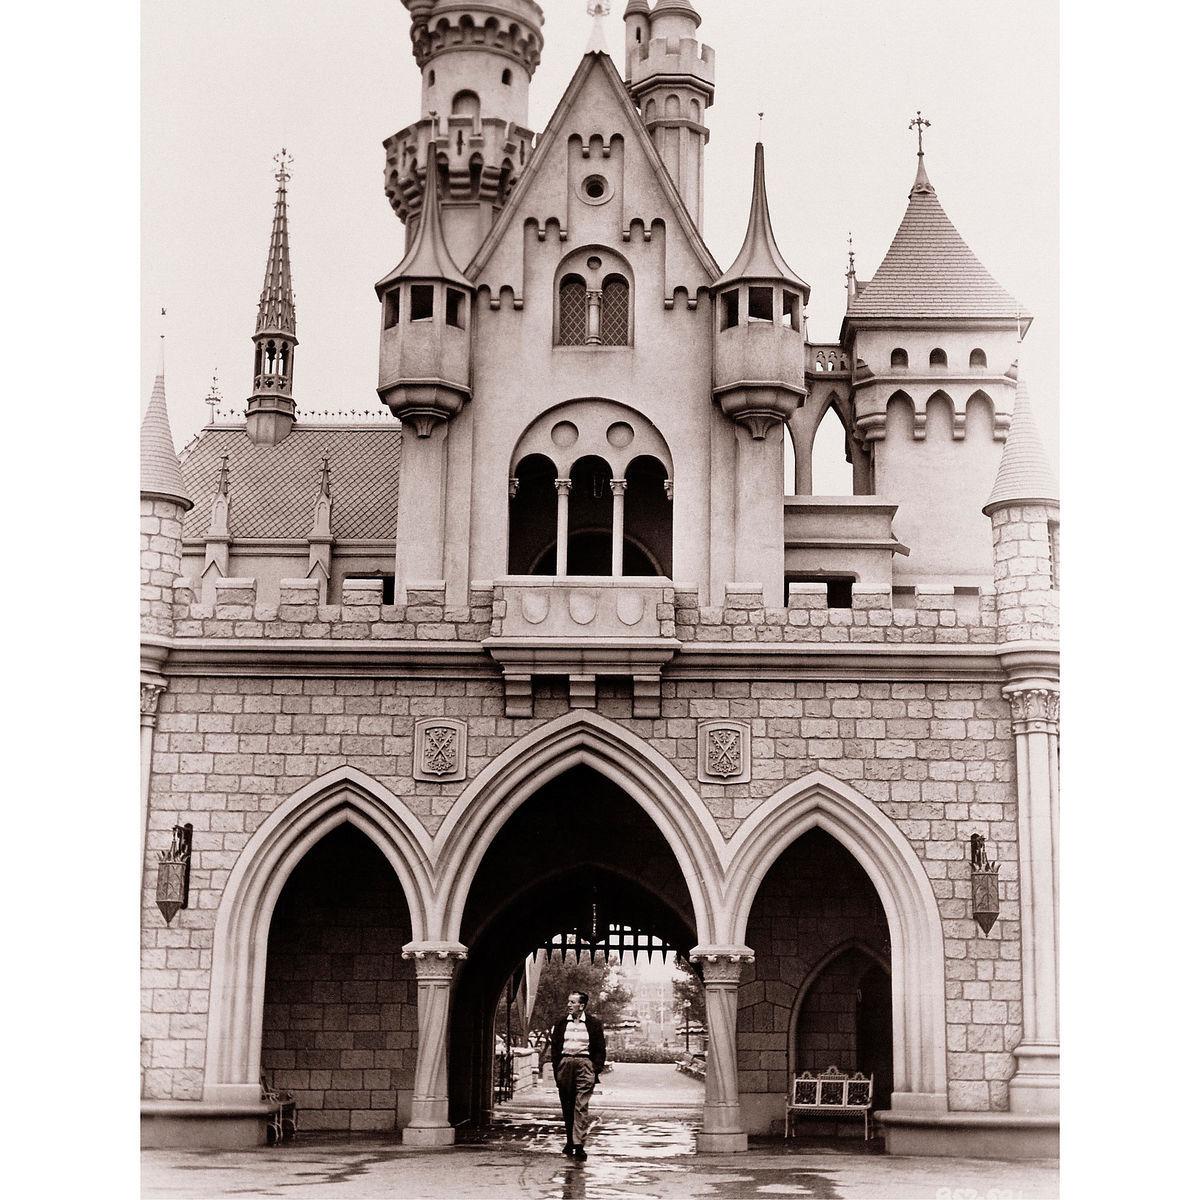 international Disney castles